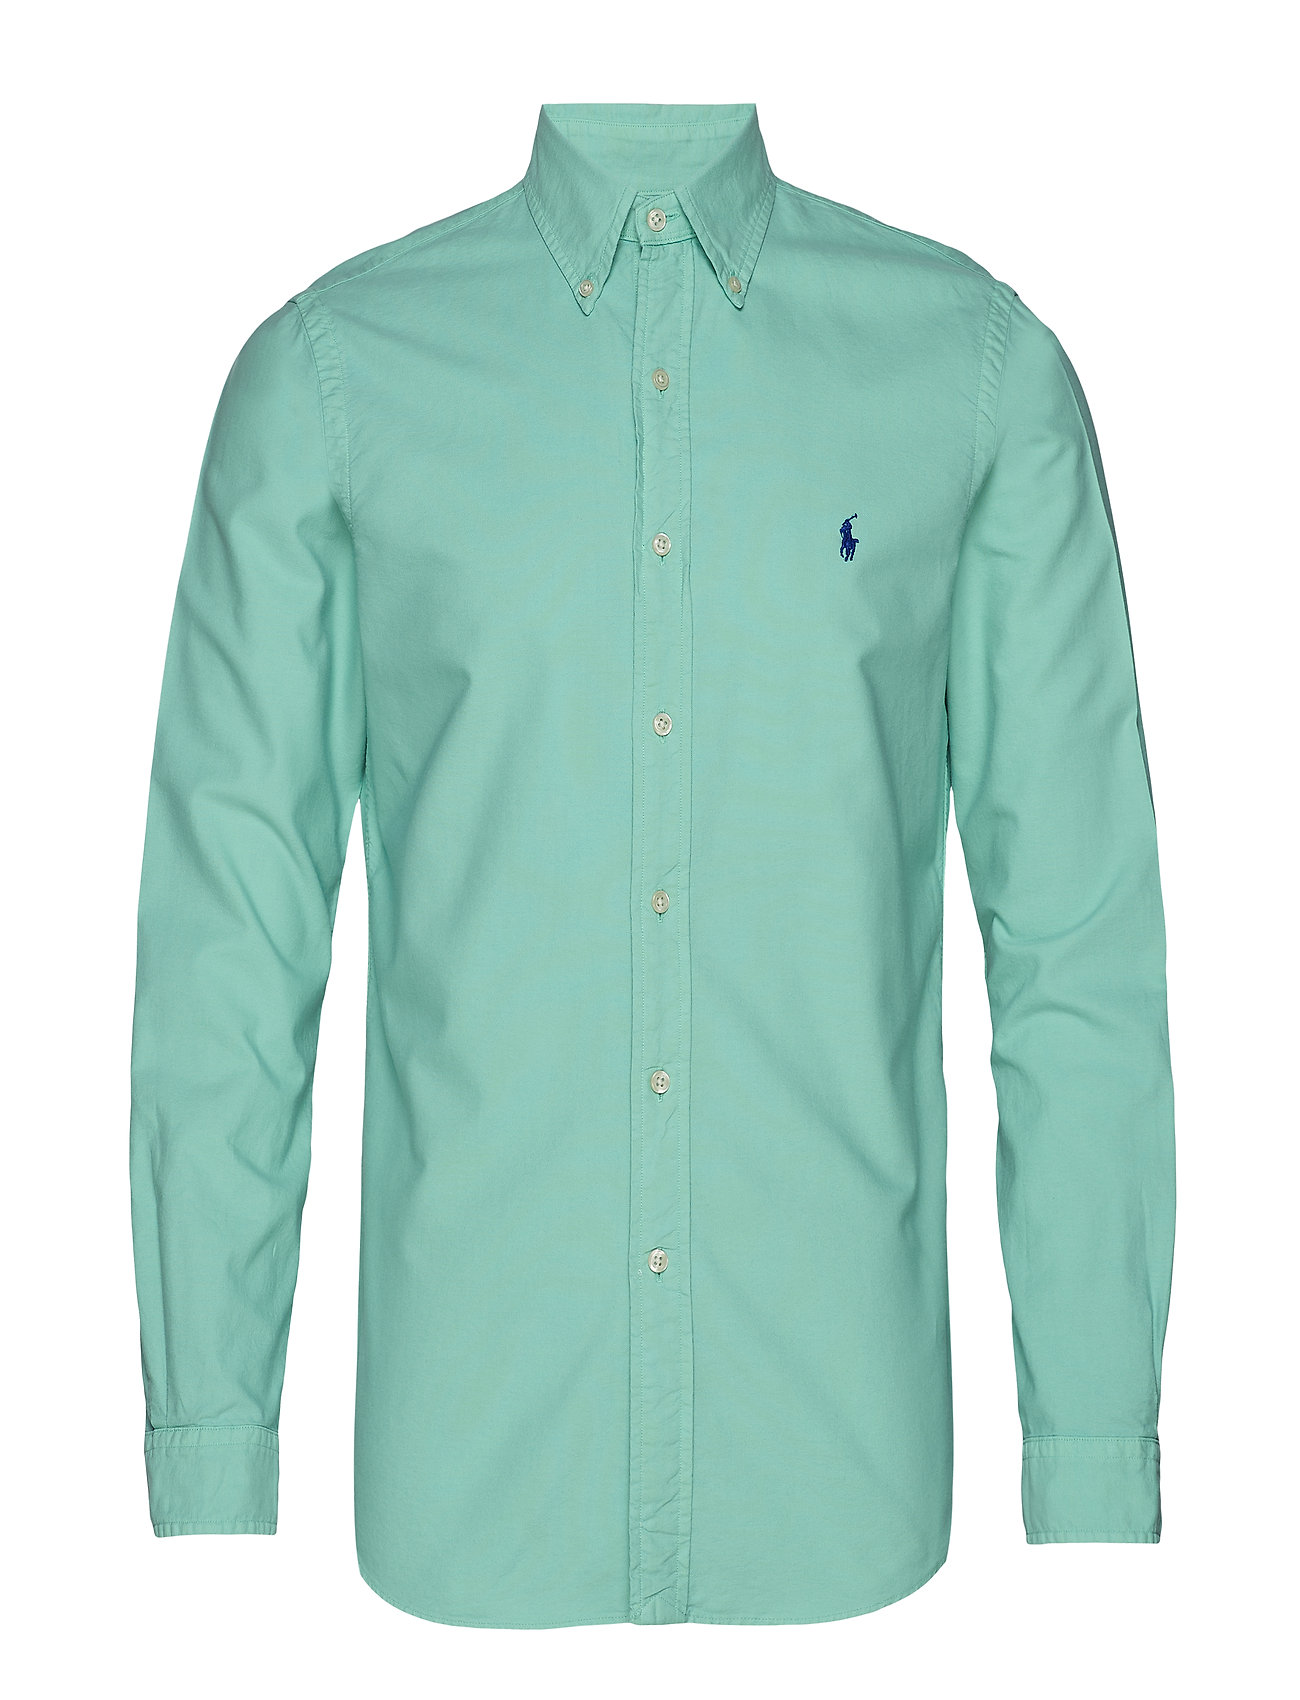 GreenPolo Slim Fit Shirtsunset Ralph Lauren Oxford DW29IEH